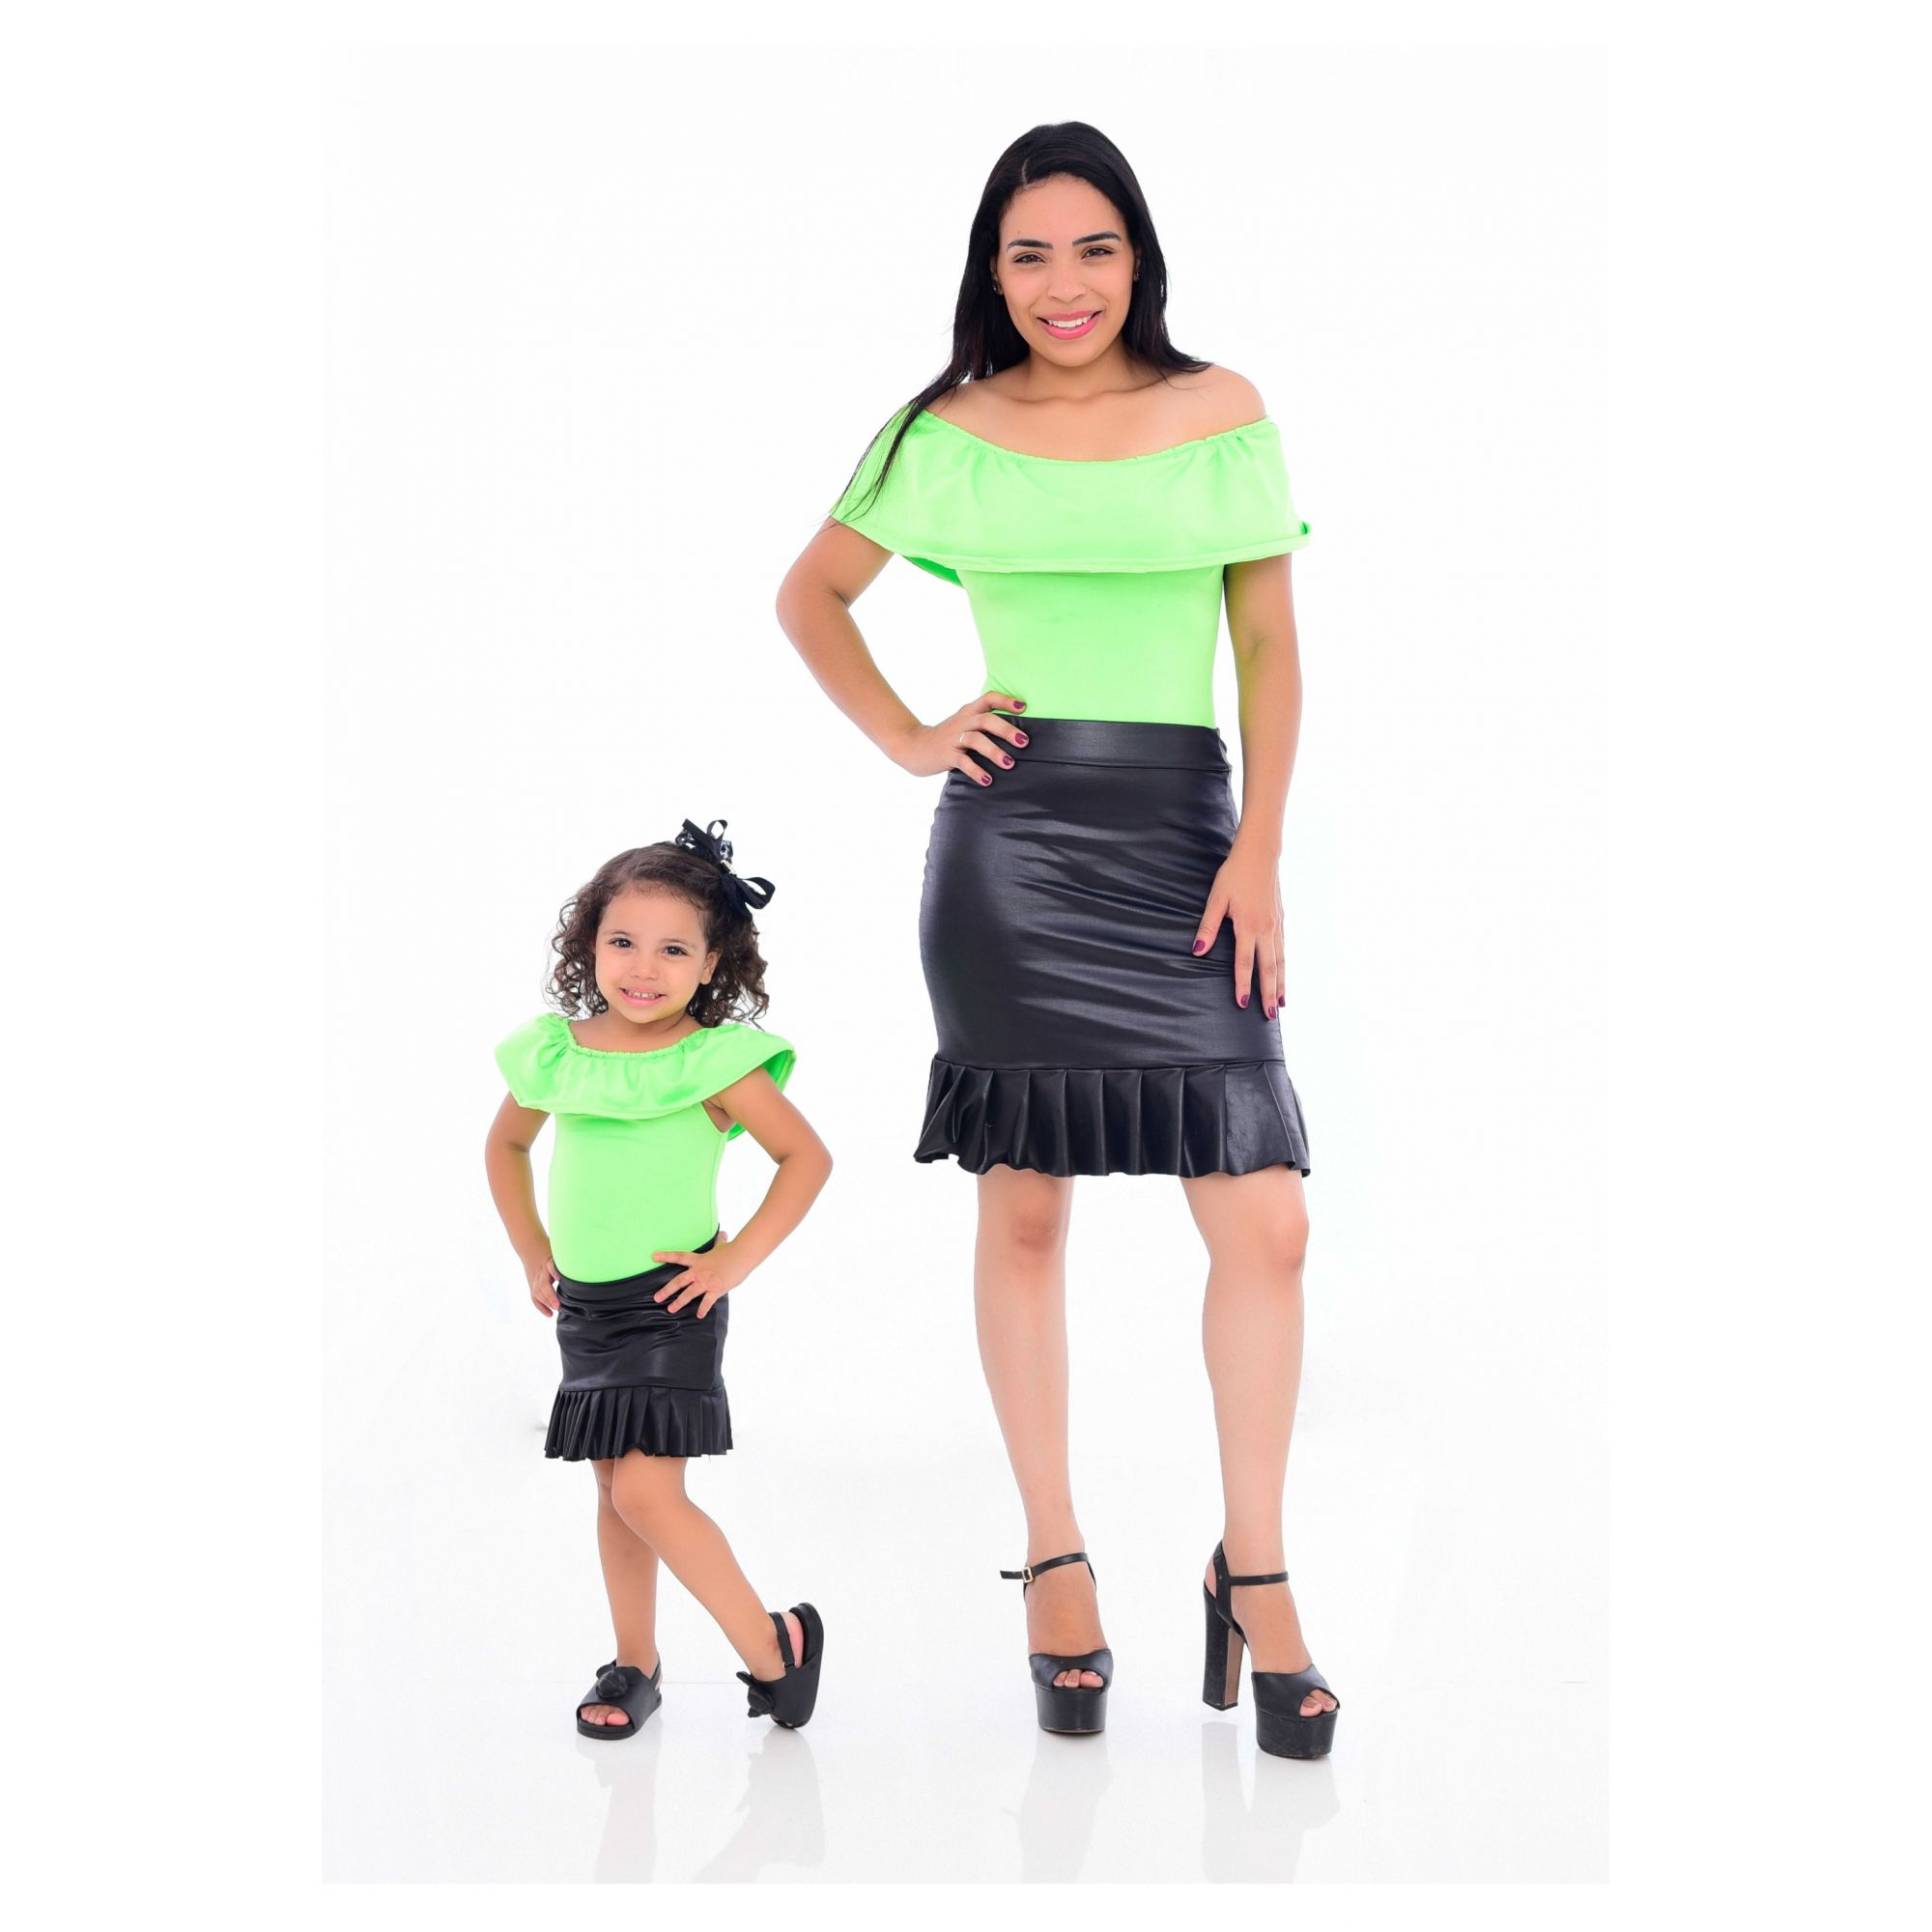 Mãe e Filha > Kit 02 Bodys Femininos Neon Verde  [Coleção Tal Mãe Tal Filha]  - Heitor Fashion Brazil